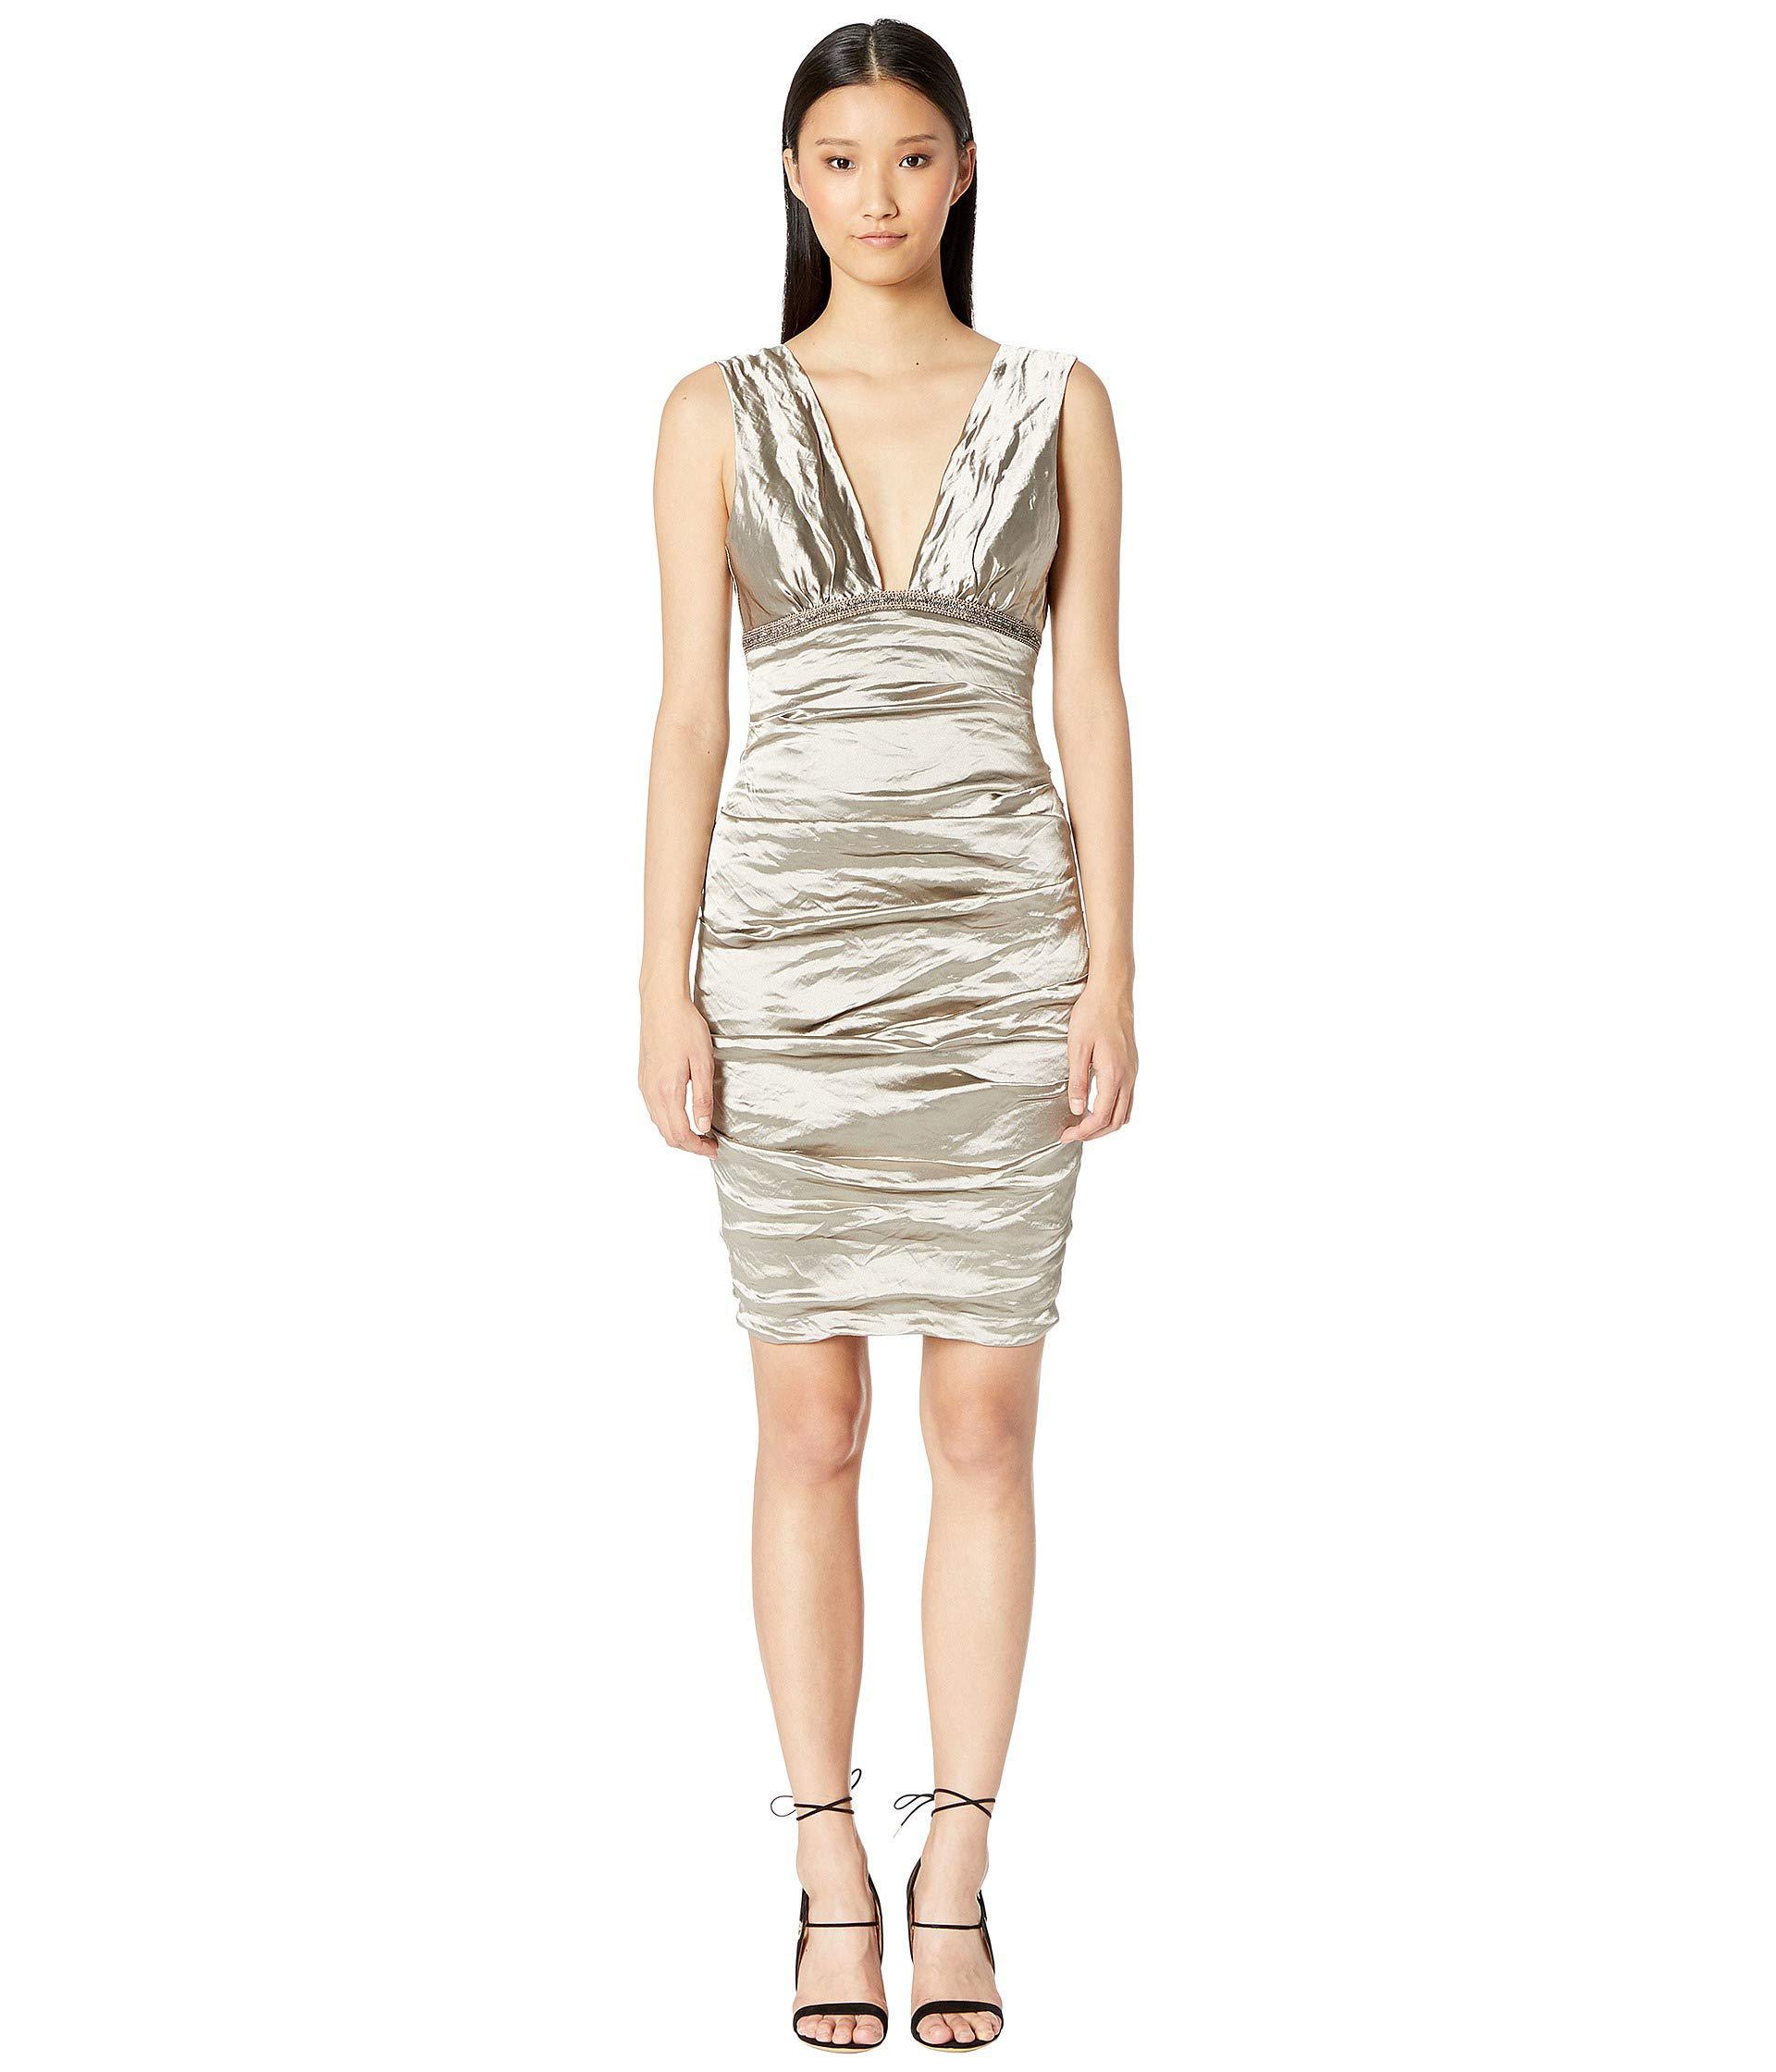 Lyst - Nicole Miller Techno Metal Plunge Dress (cava) Women s Dress 222a54d9a